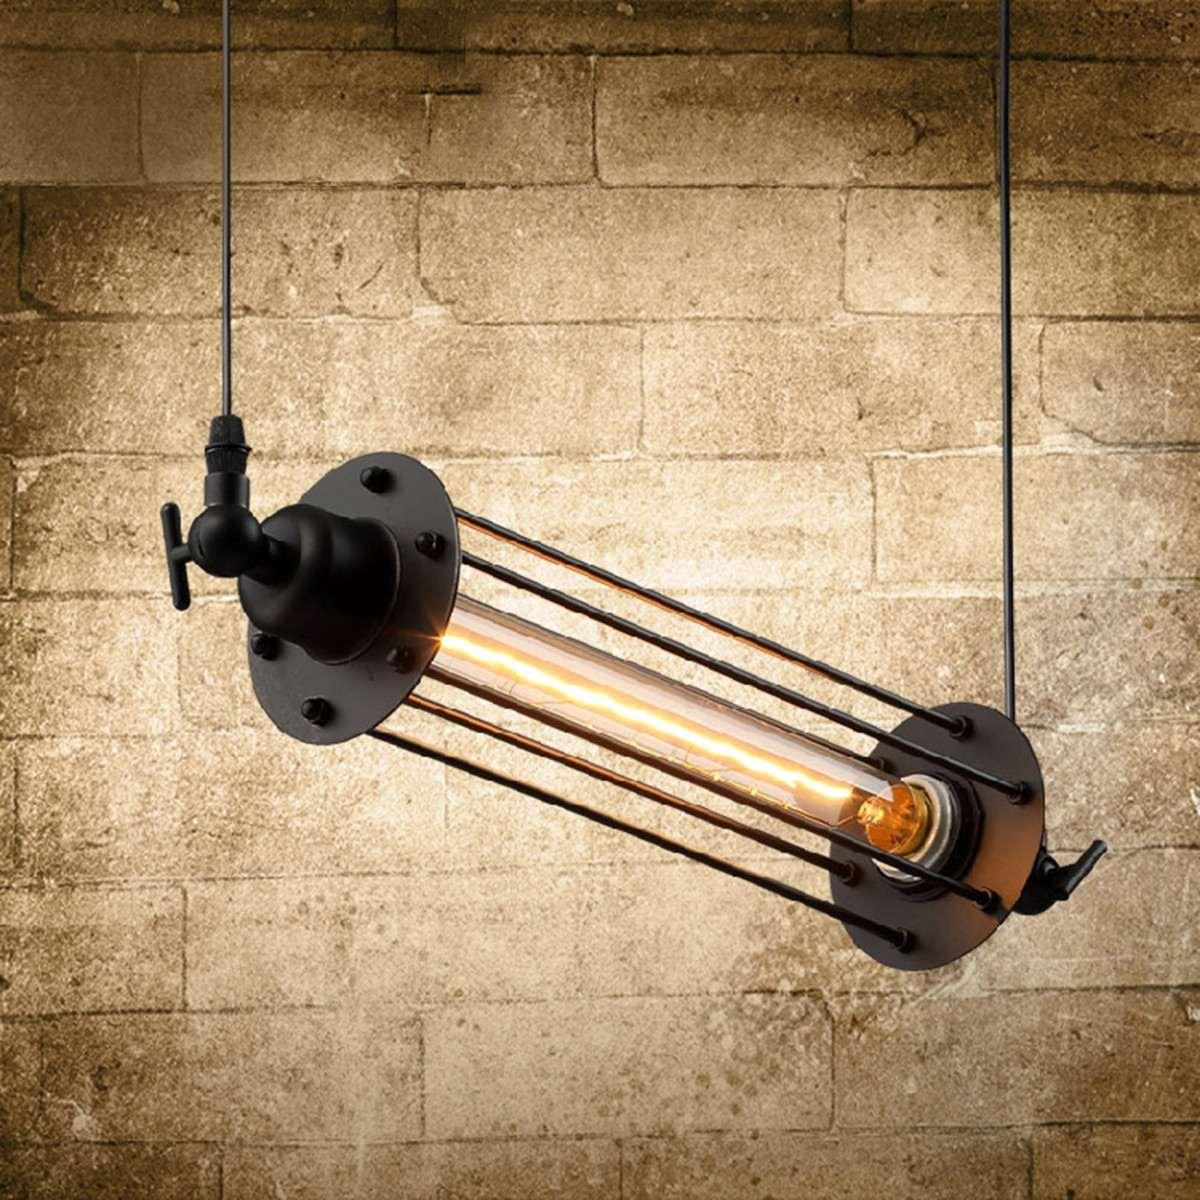 Industrial Retro Vintage Flute Ceiling Lamp E27 Hanging Pendant Light Cafe Bar Restaurant Indoor Lighting Decor AC 110-240V loft vintage edison glass light ceiling lamp cafe dining bar club aisle t300